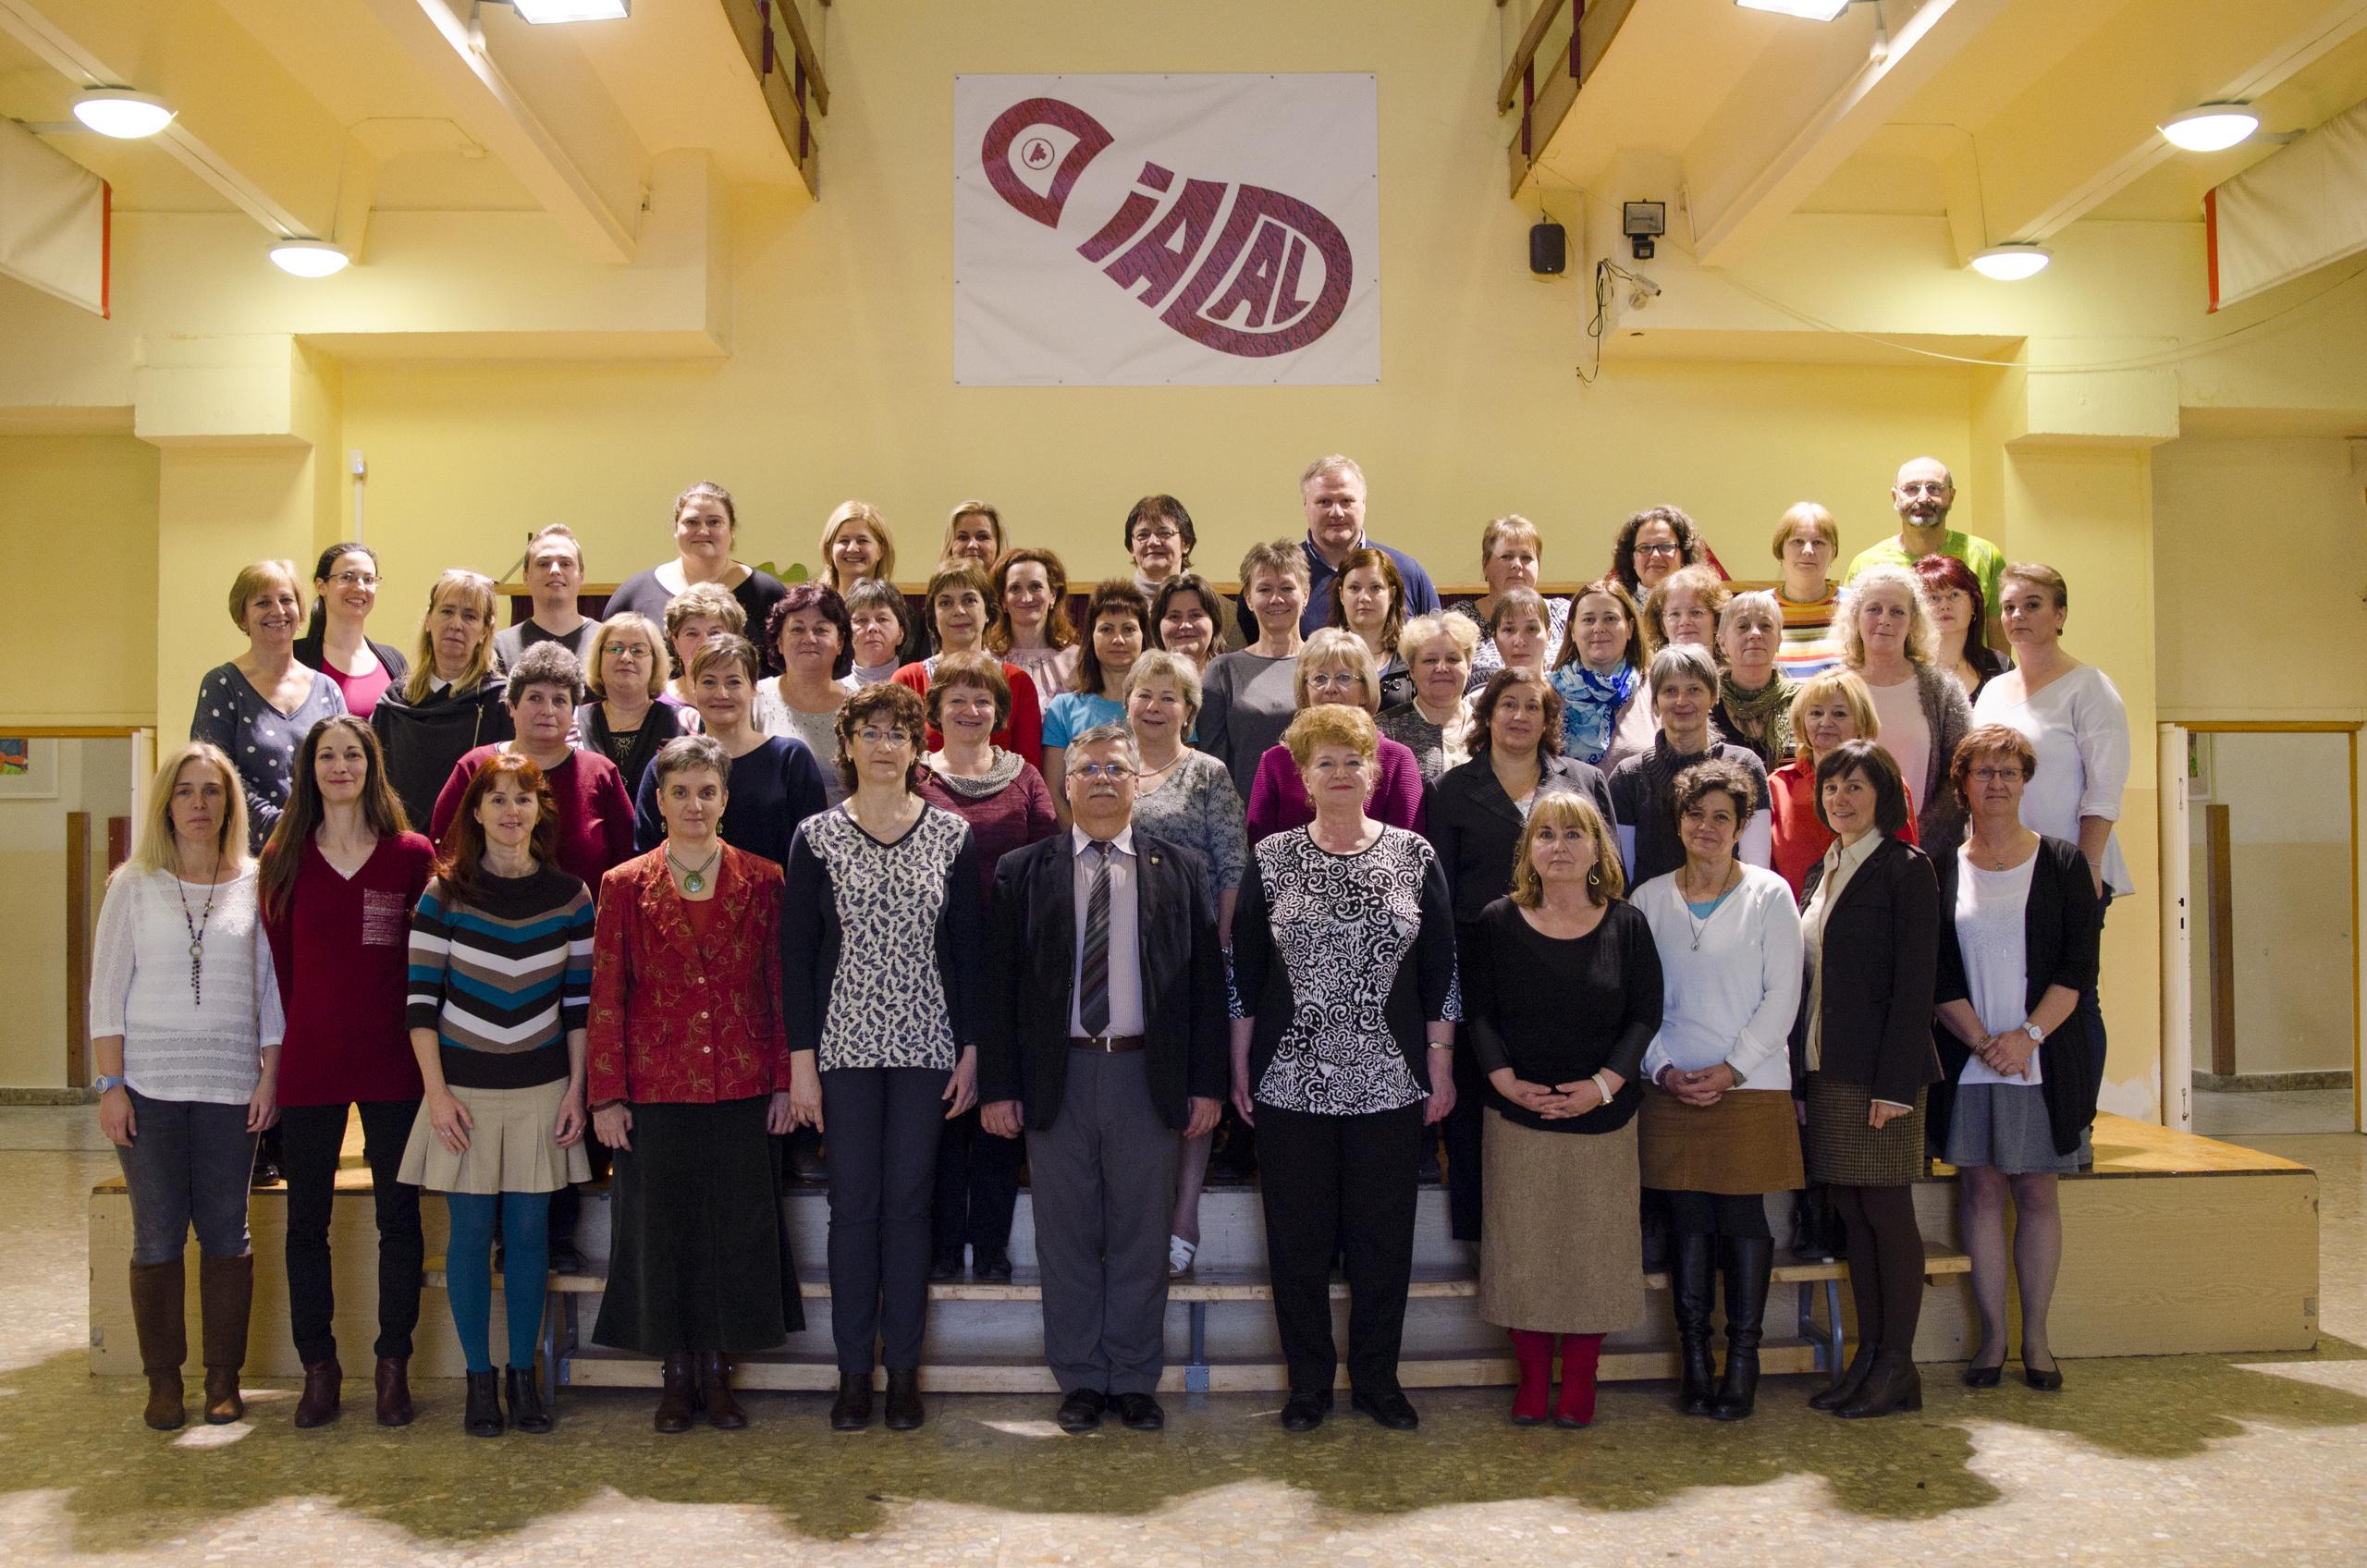 Diadal Úti Általános Iskola: Diadal - Tantestületi tabló 2018.02. - indafoto.hu